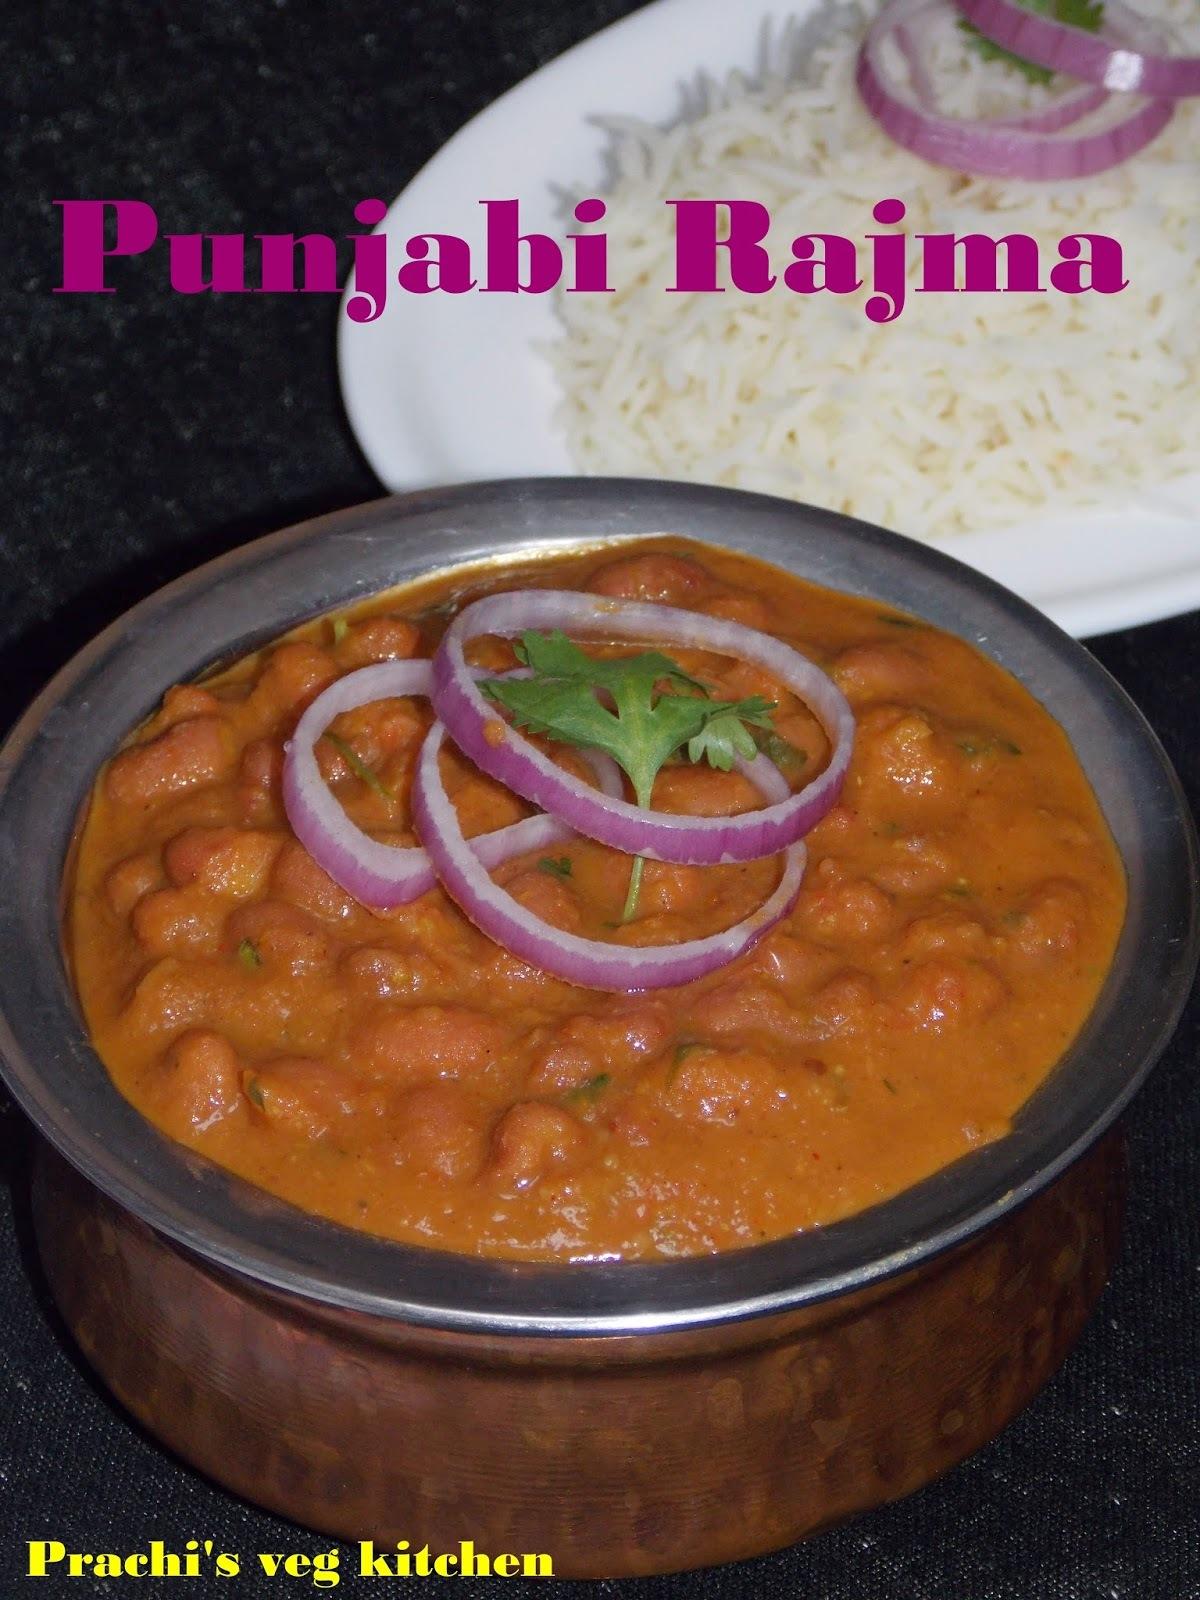 Rajma /Punjabi Rajma /Rajma Chawal